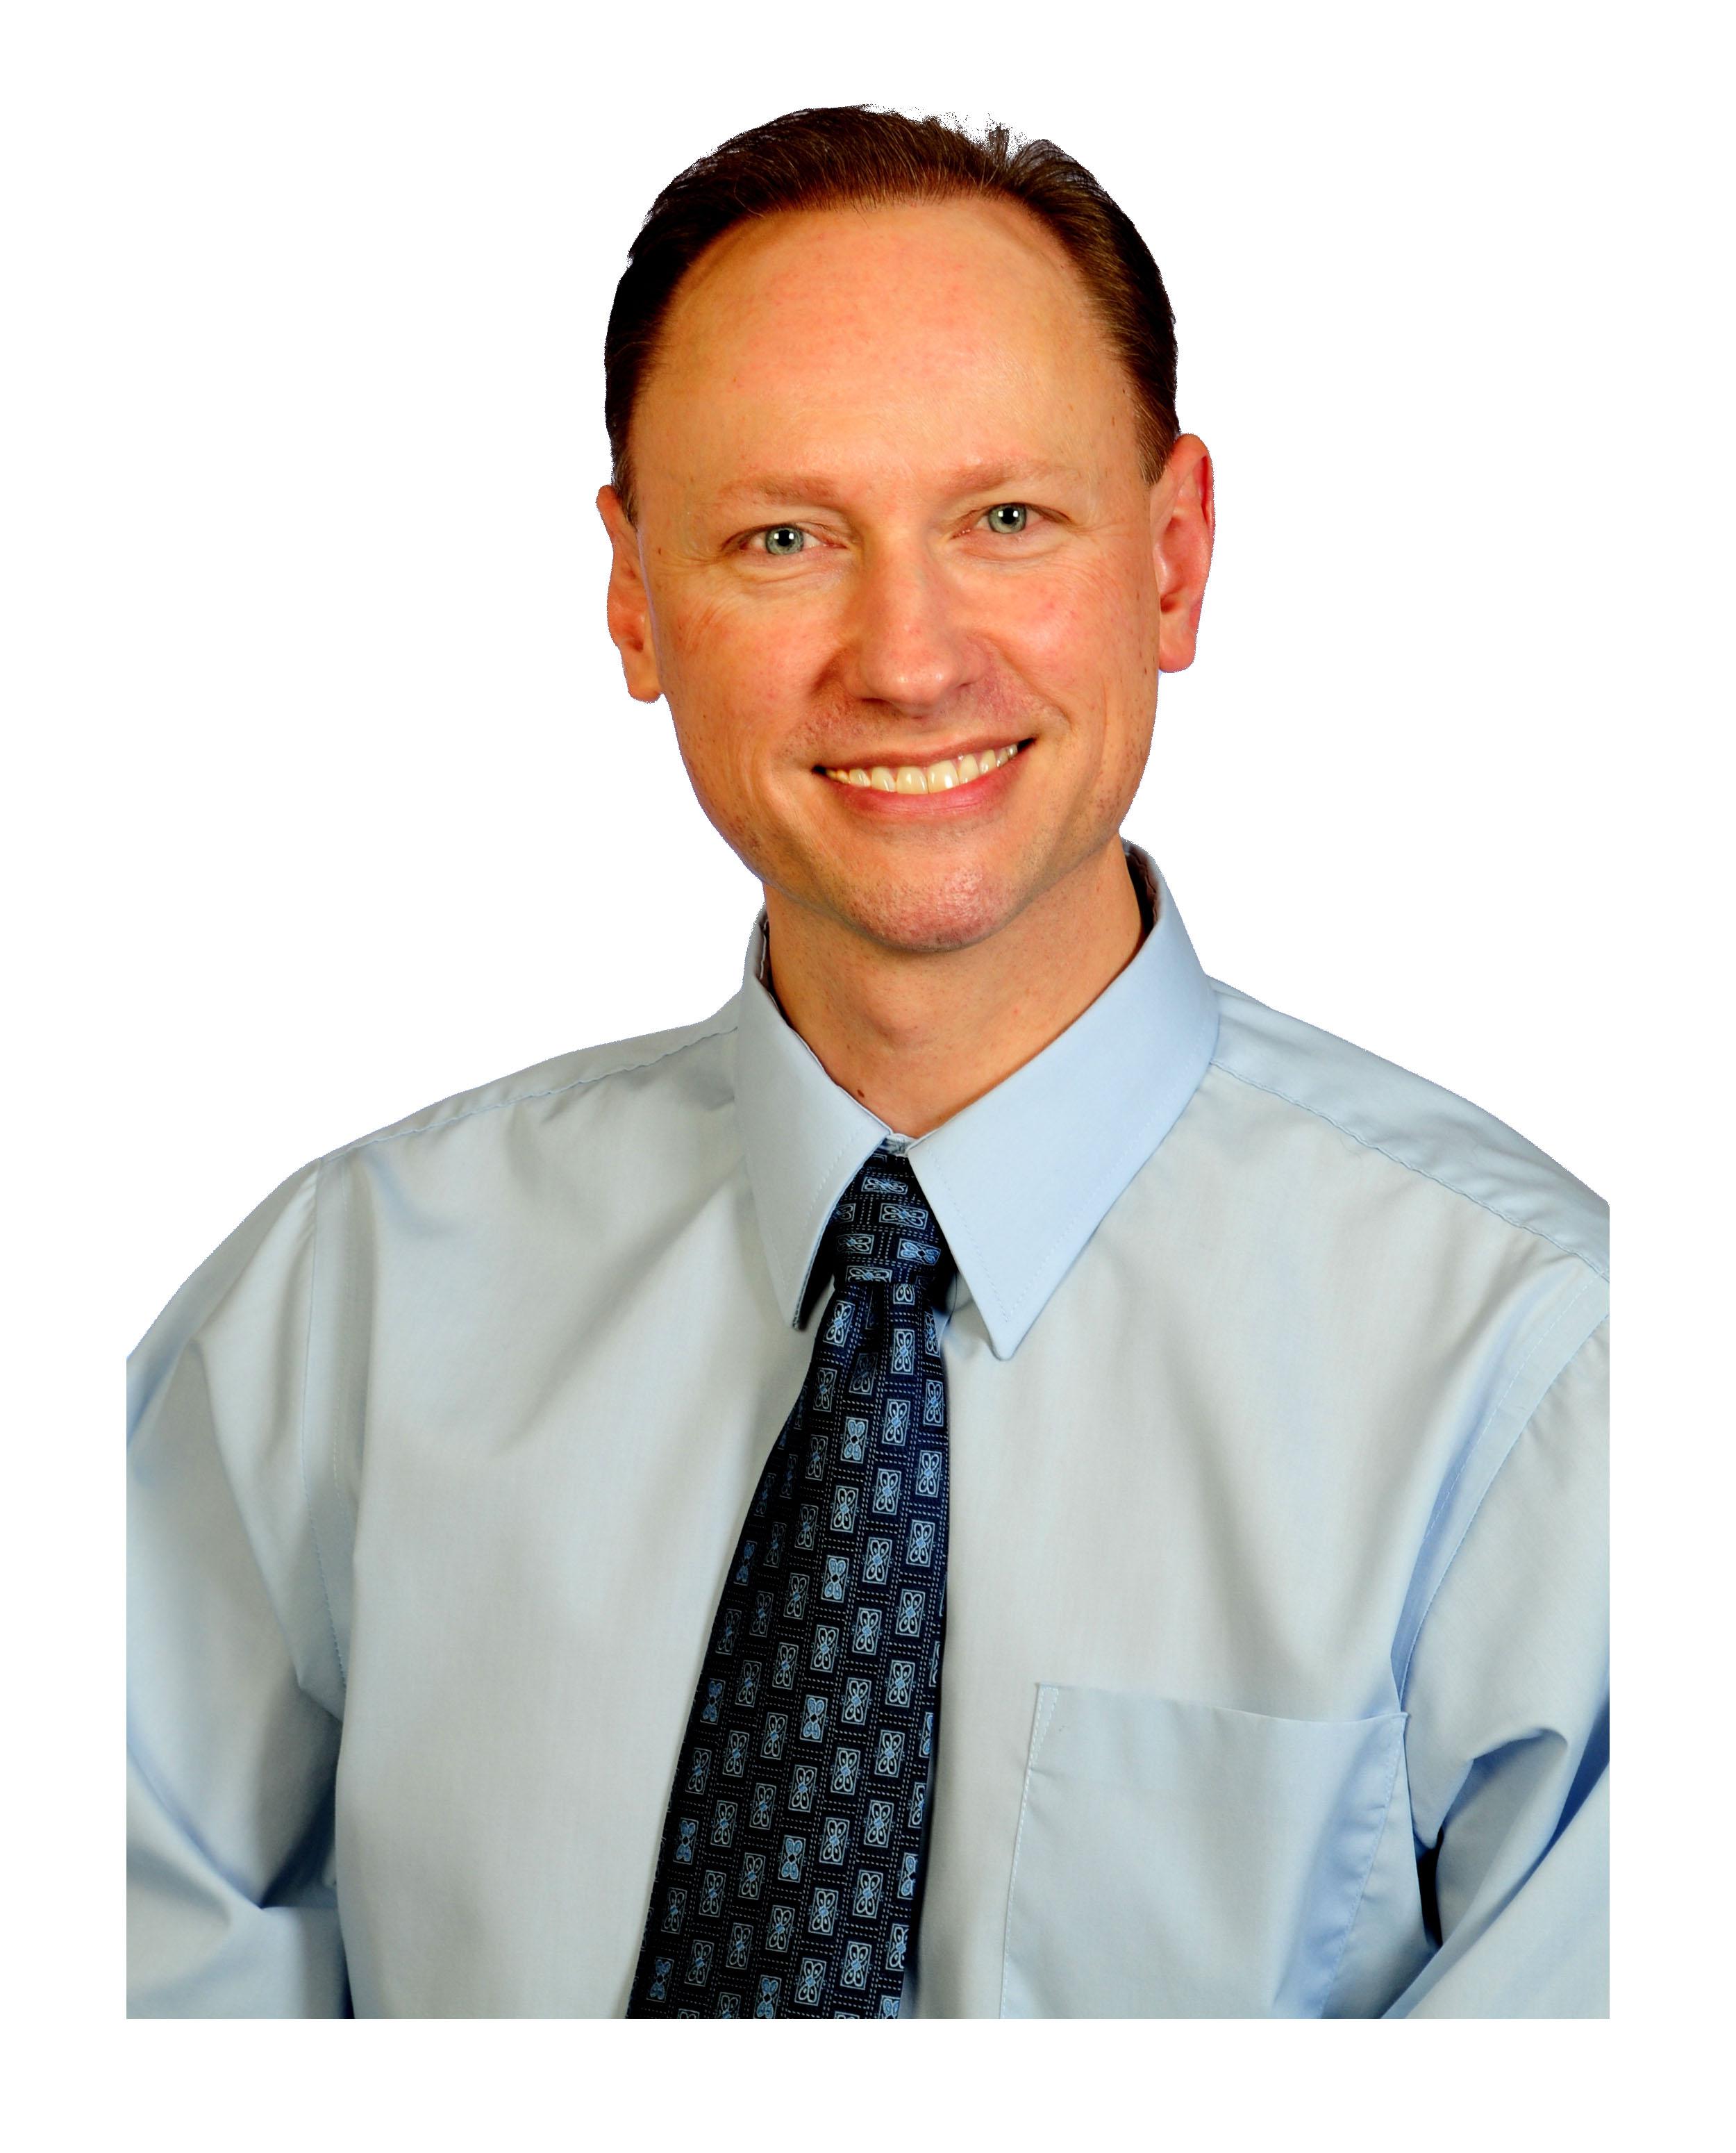 Scott Palluck